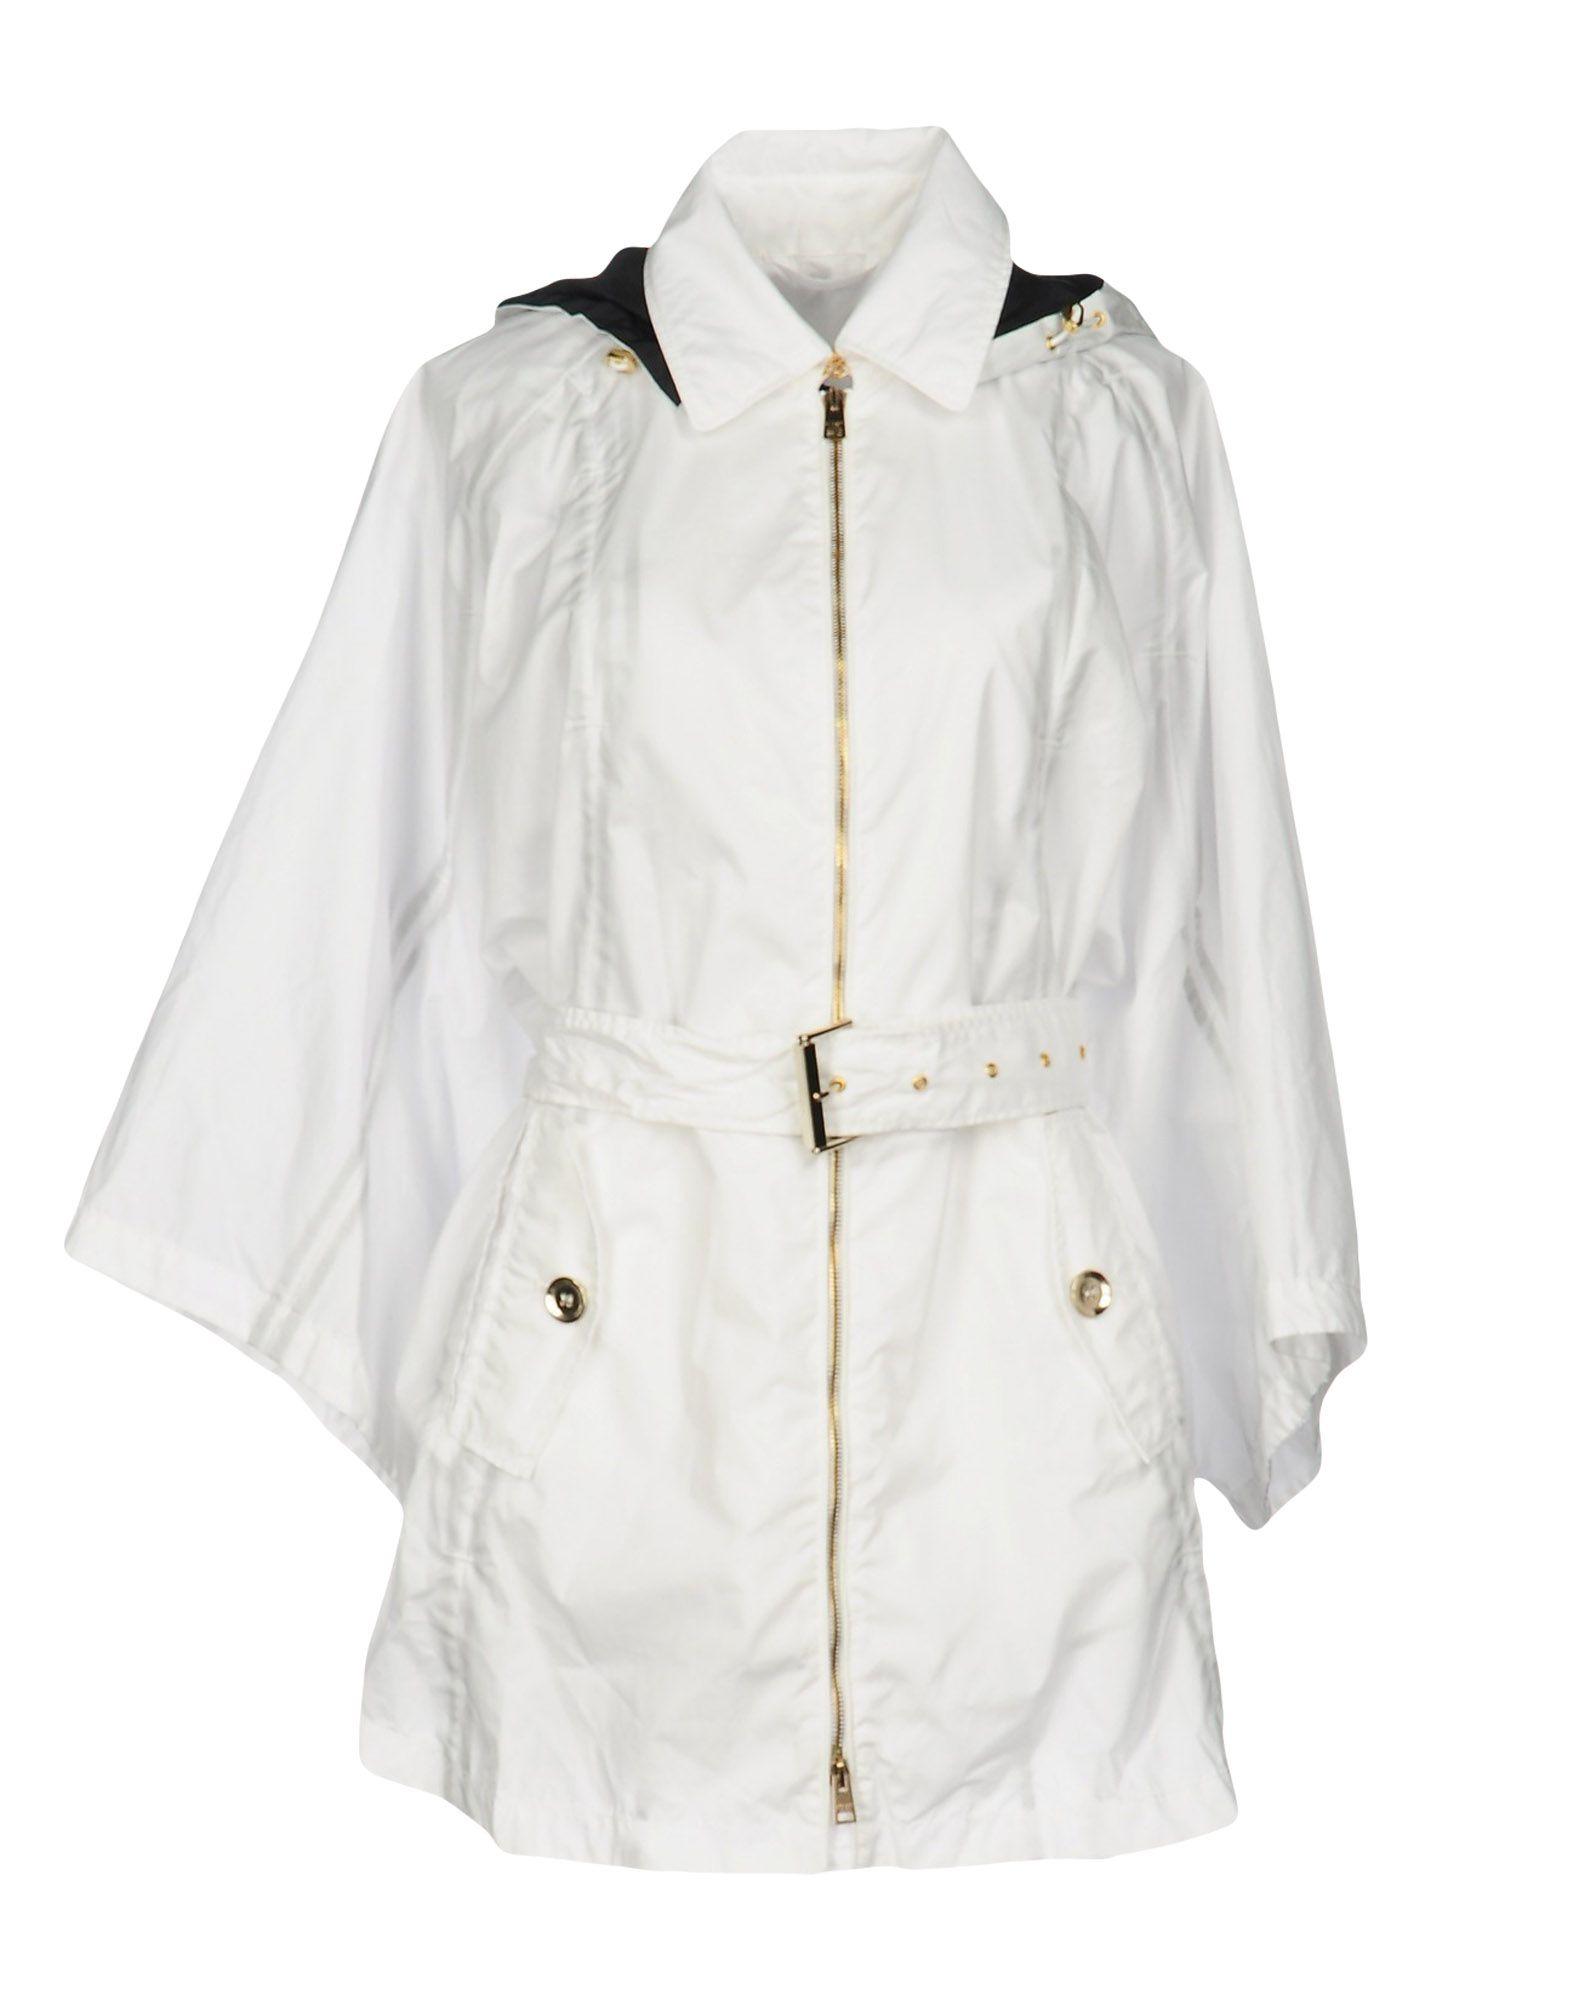 ALLEGRI Куртка 2225066030 high quality maf 22250 66030 mass air flow sensor for toyota 22250 66030 22250 66010